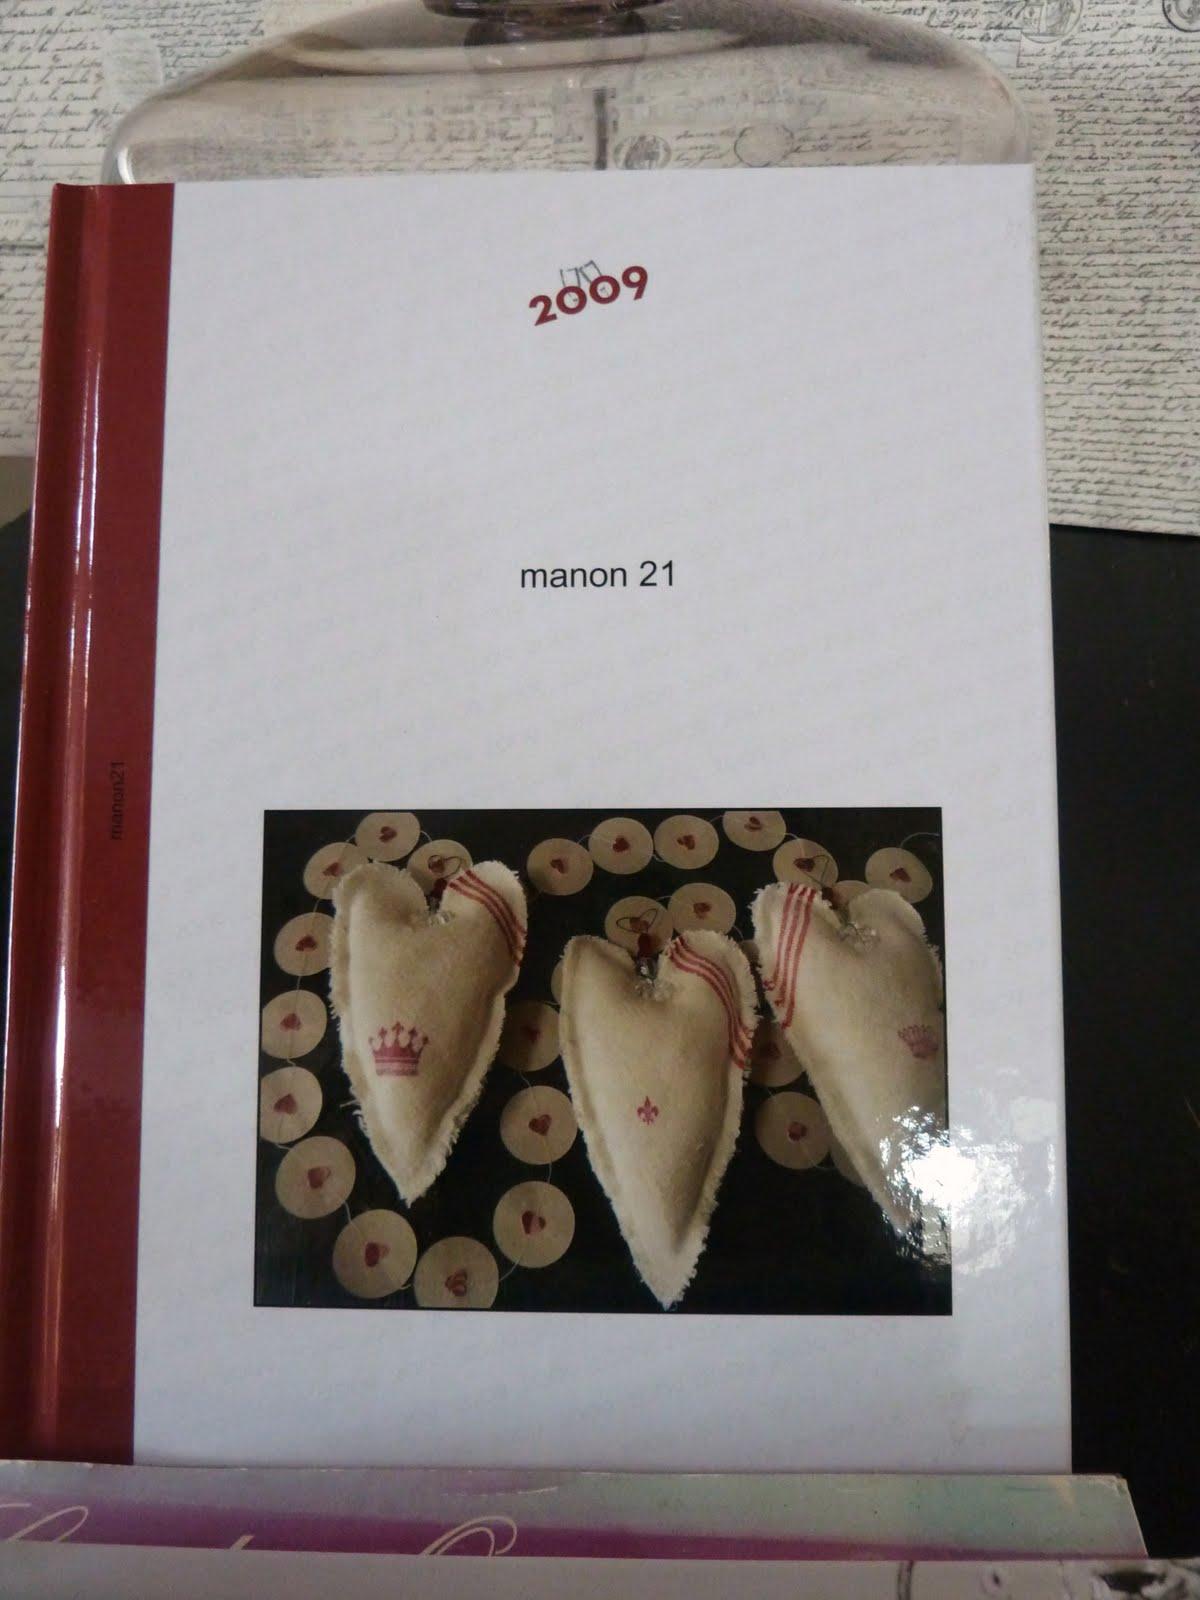 manon21